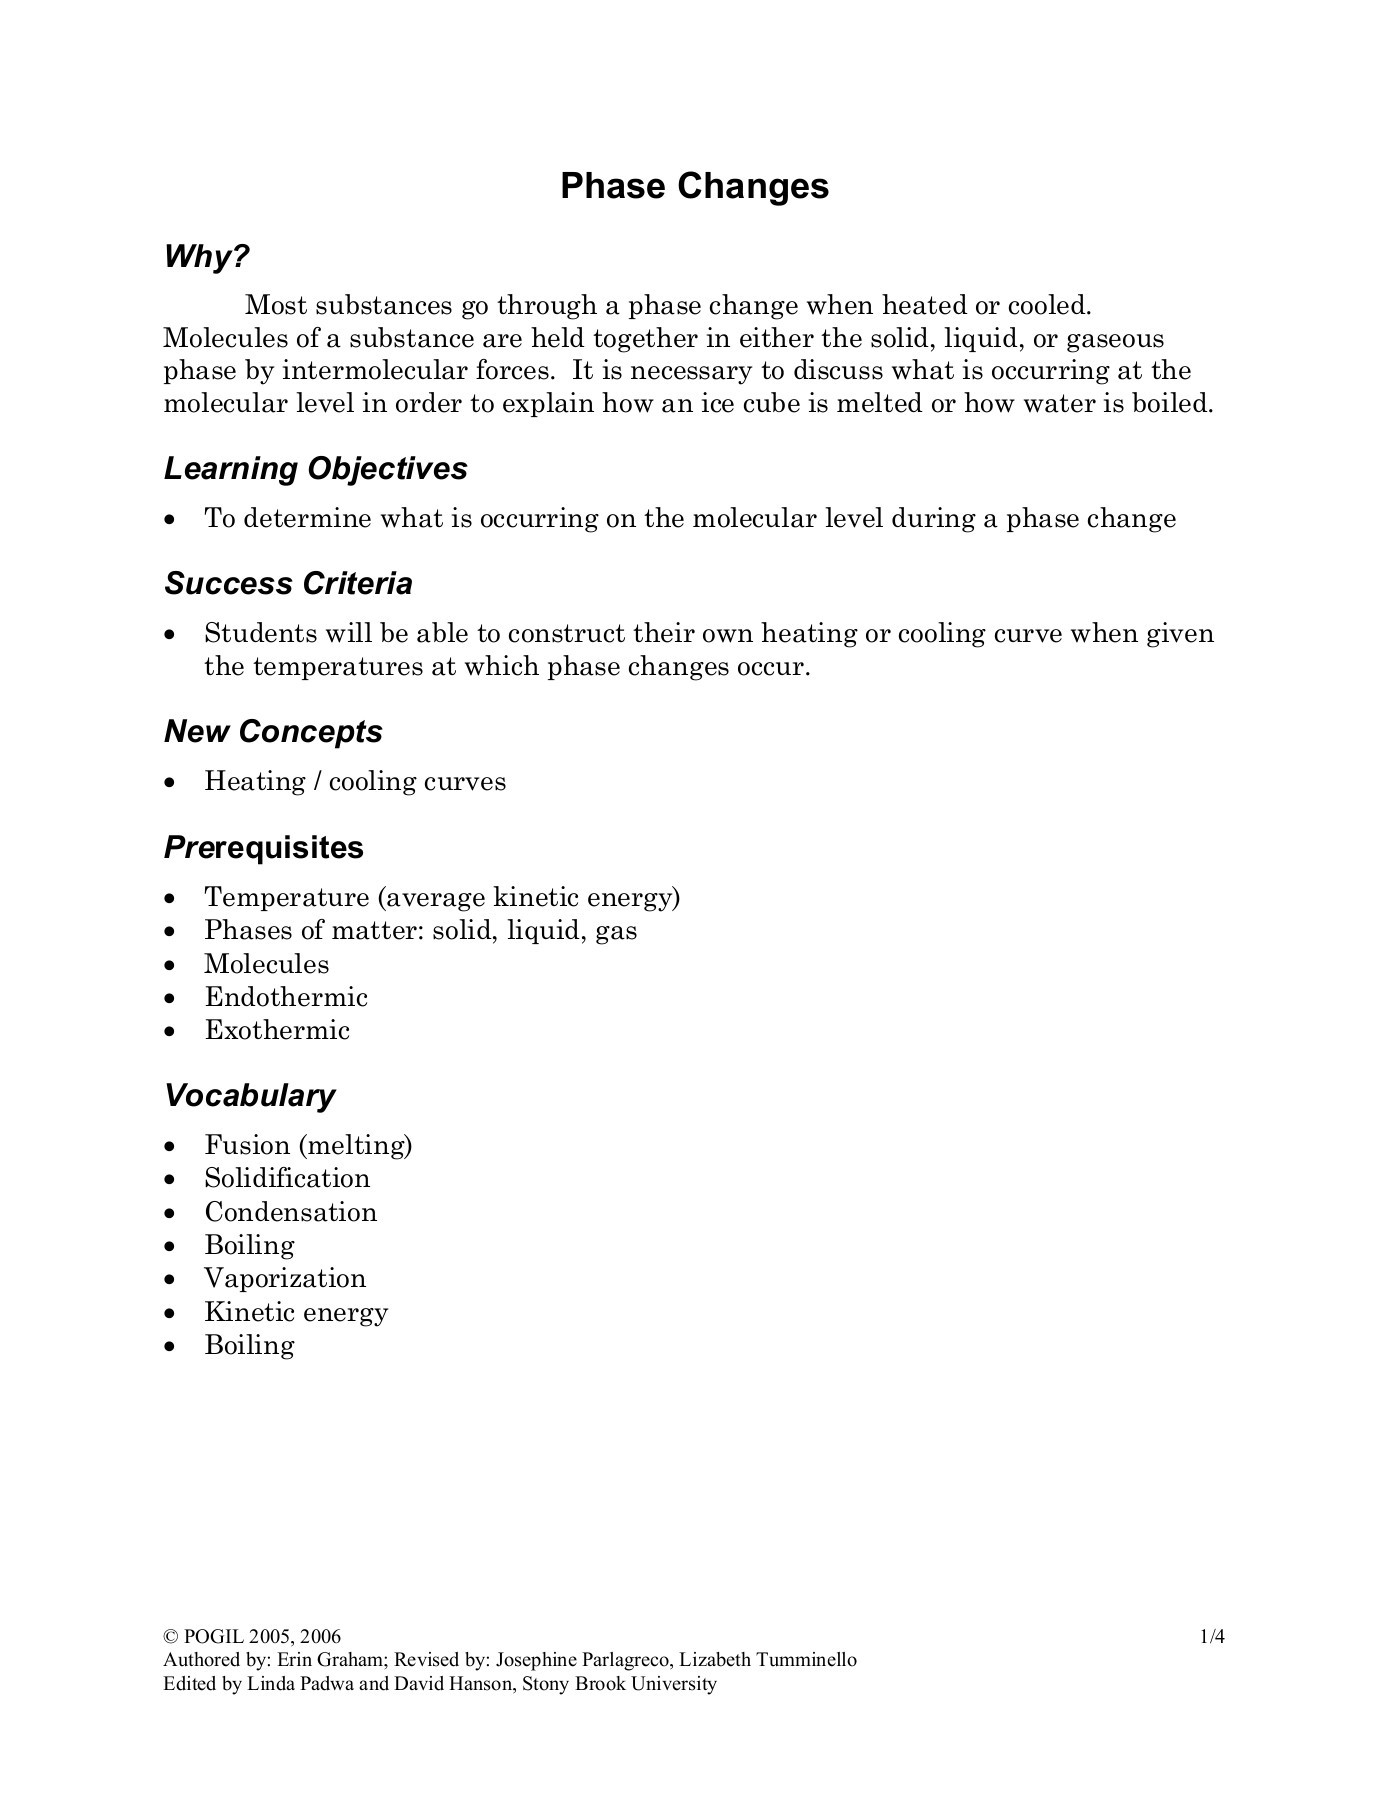 Phase Change Diagram Worksheet Answers